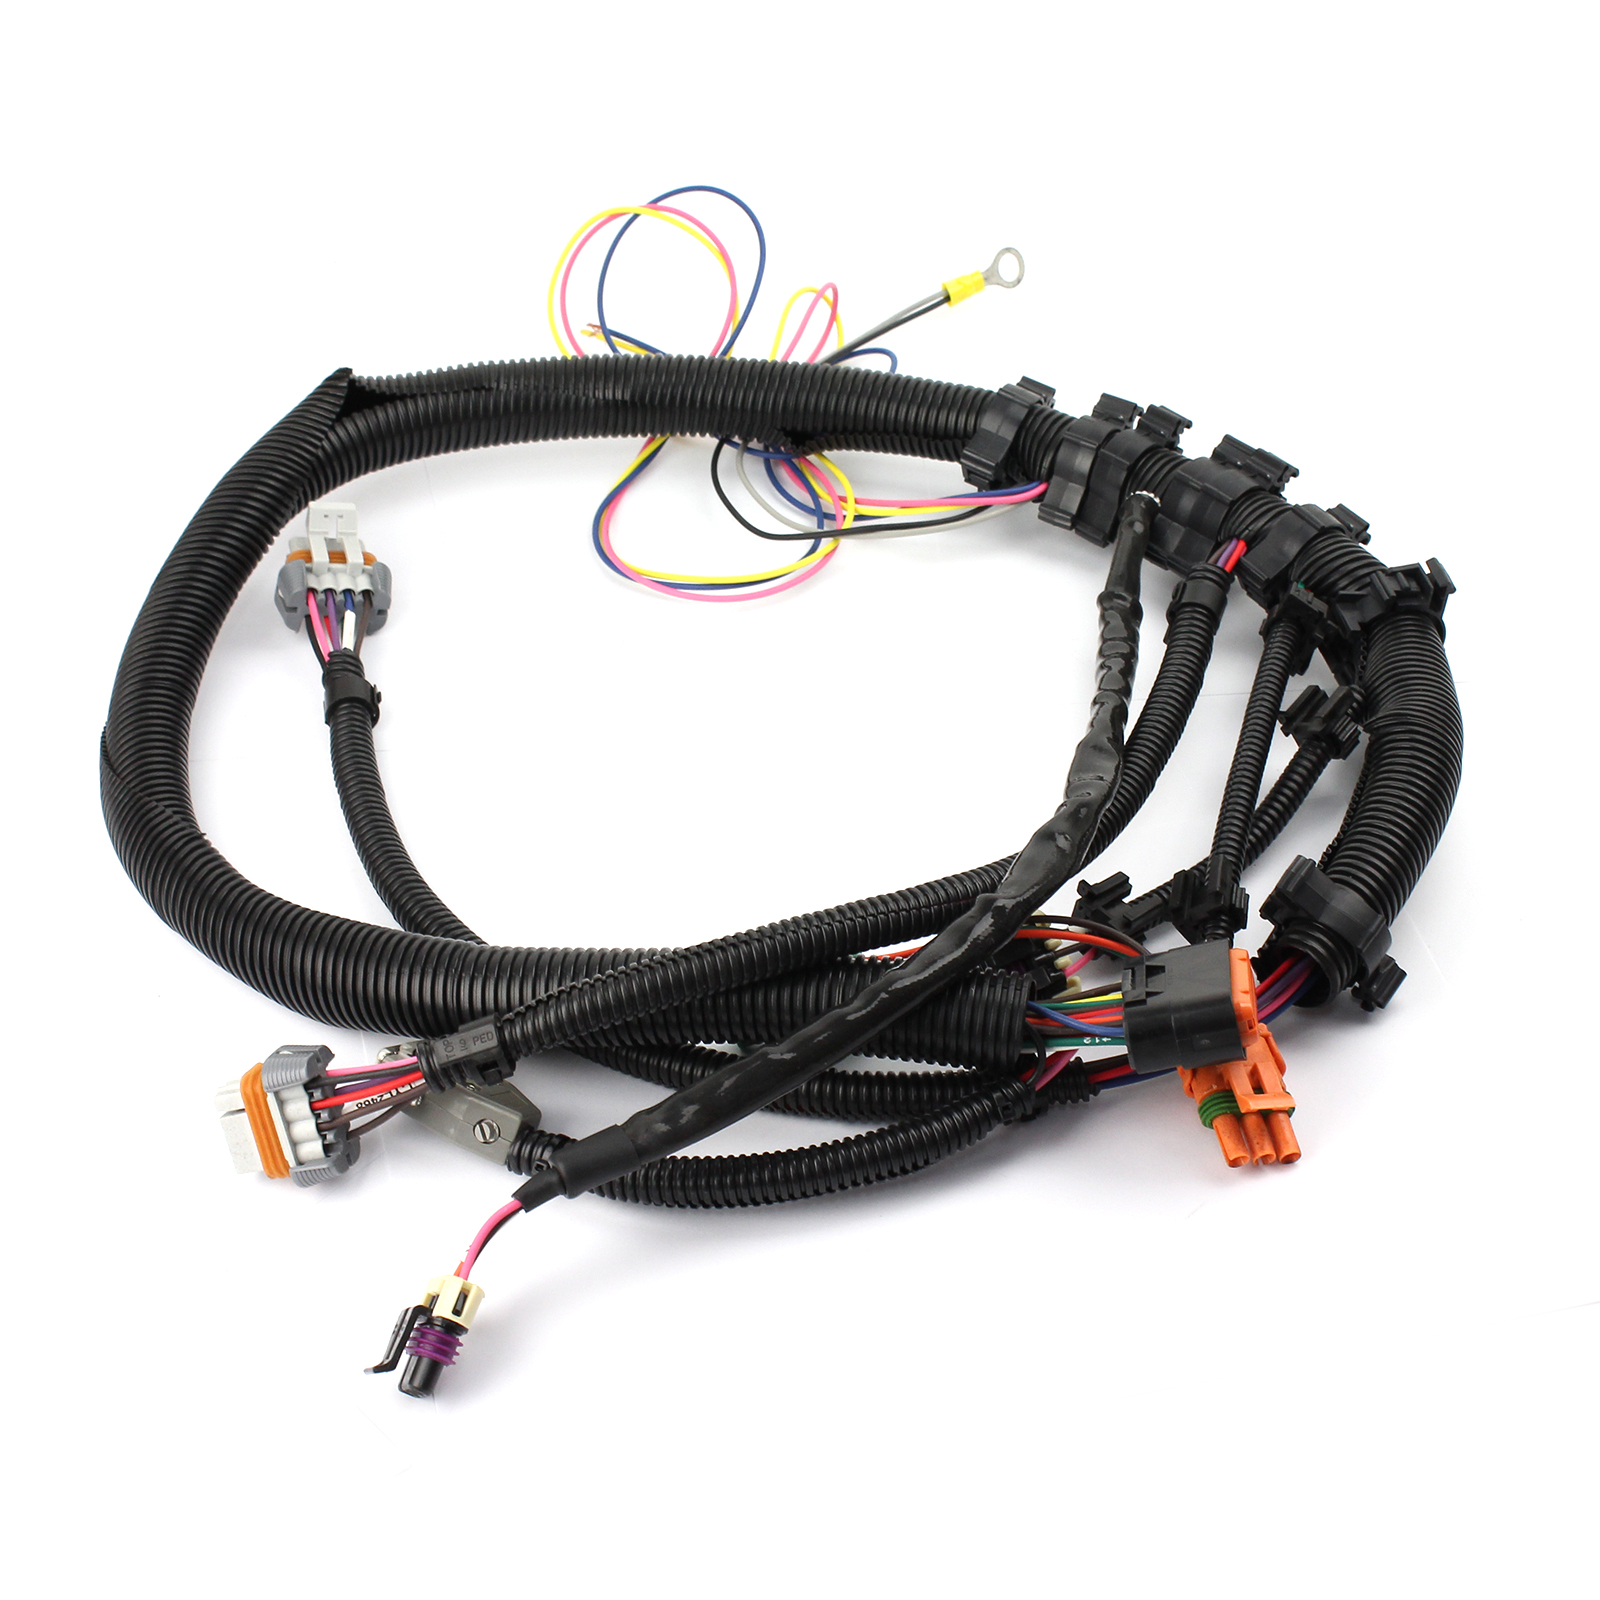 Gm LS1 LS6 24-Tooth Black Crank Sensor Wiring Harness Intake Manifold Mount